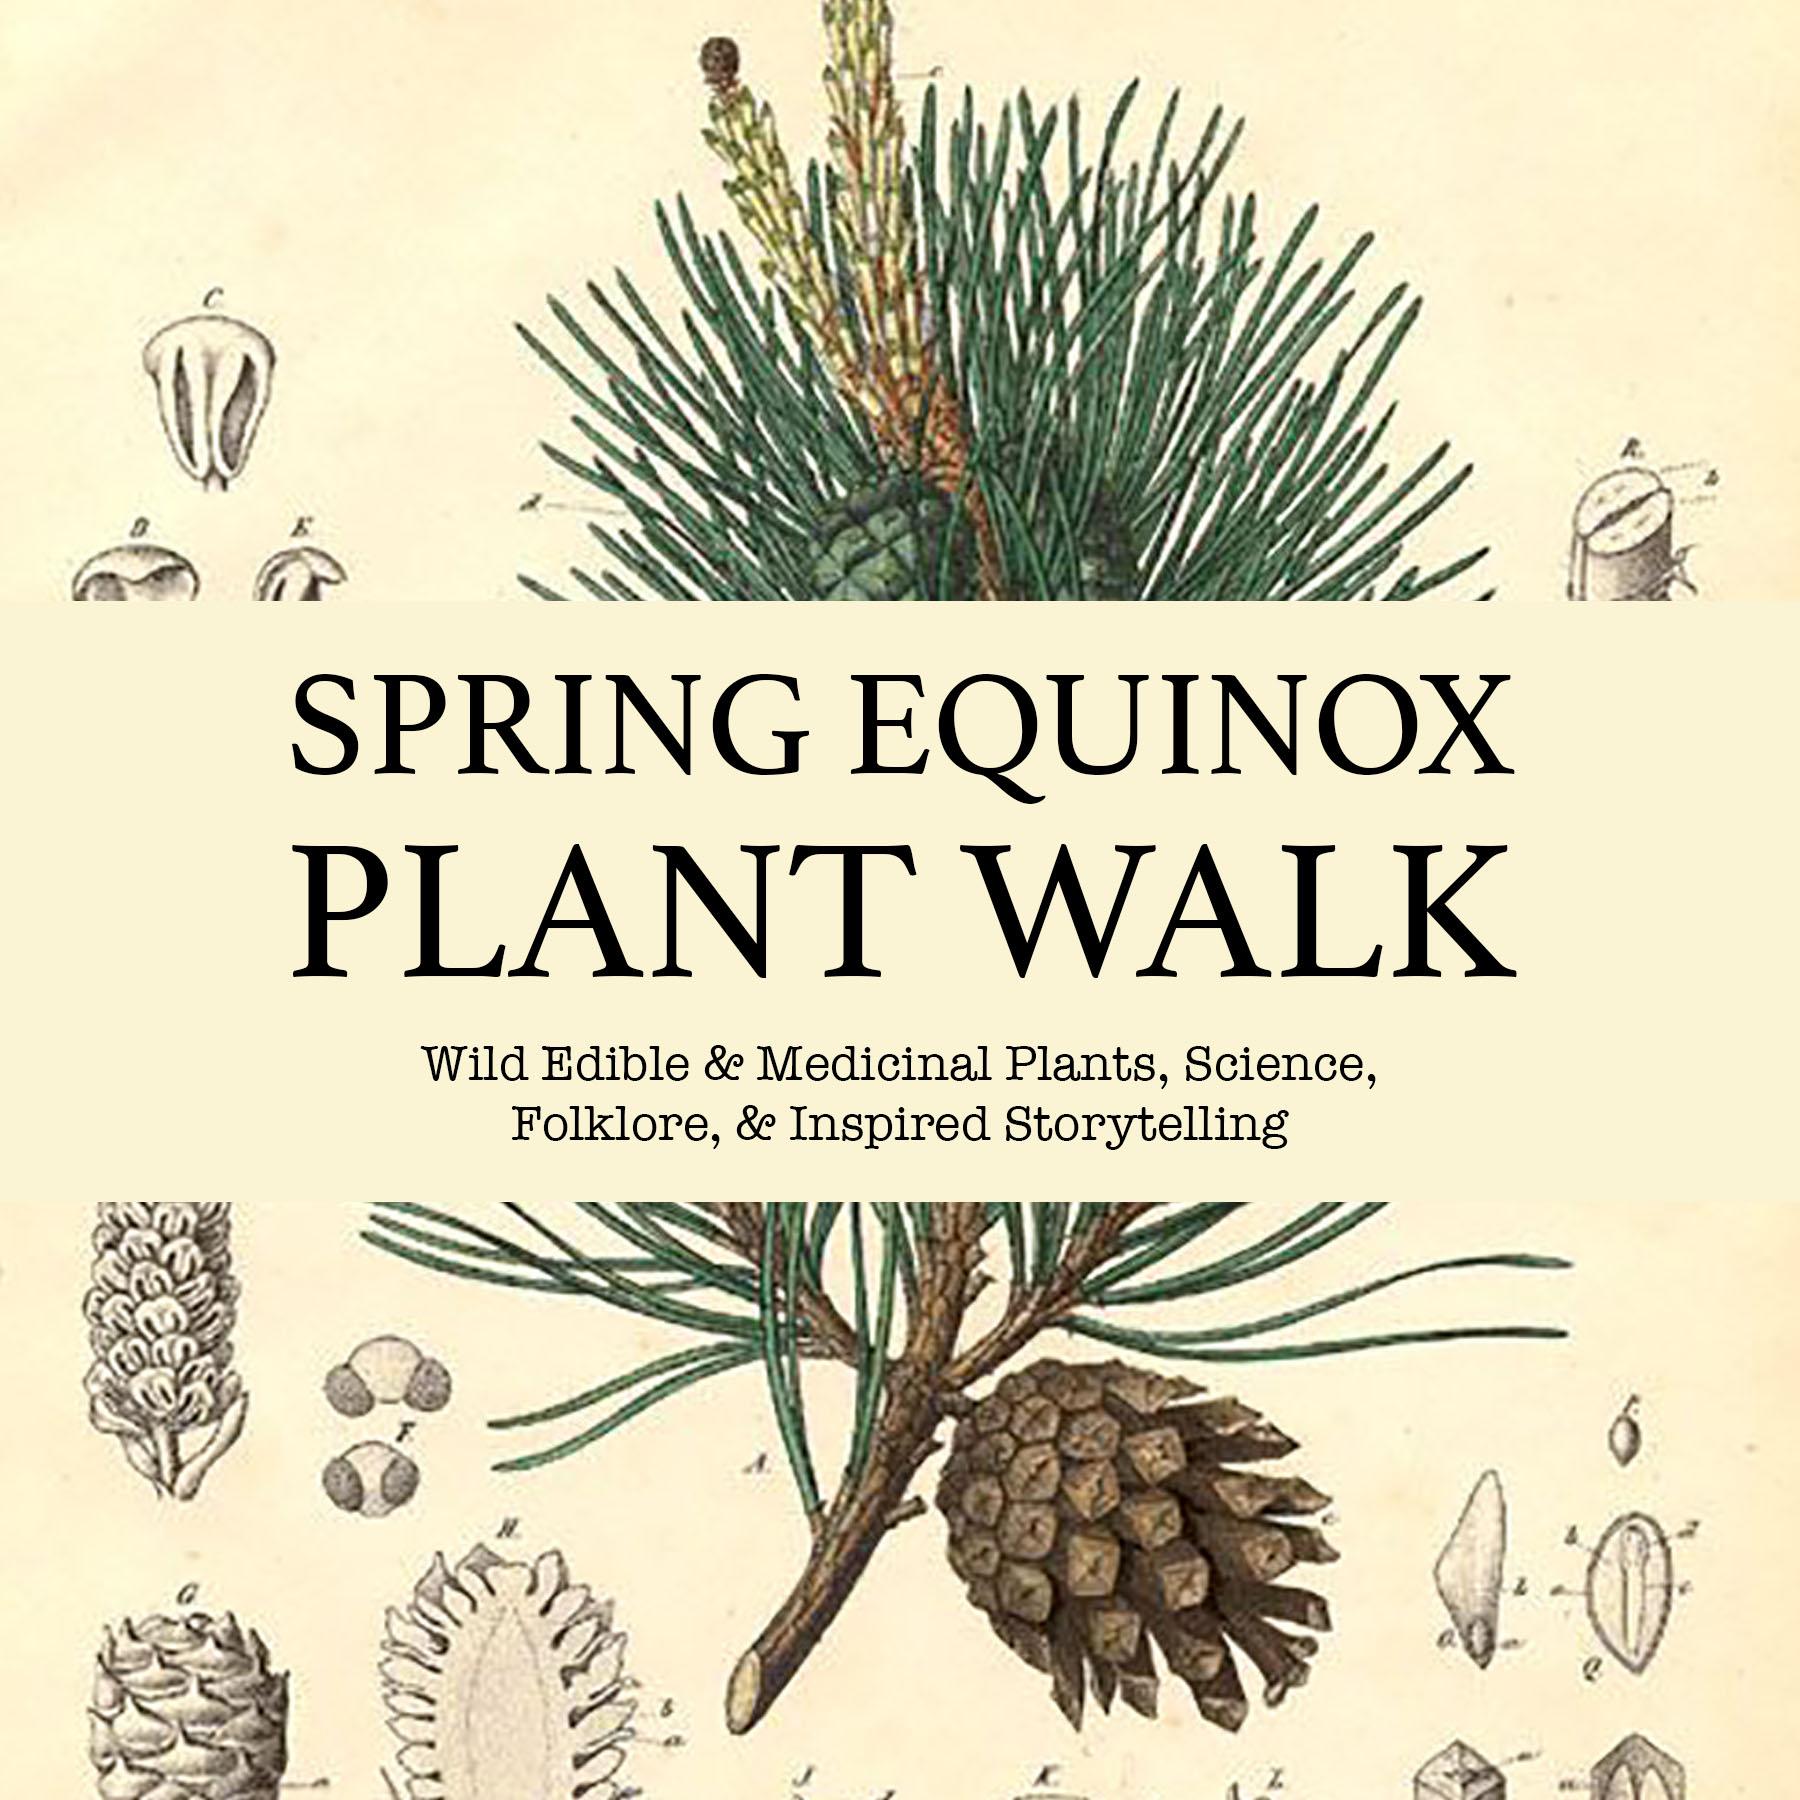 Spring-Equinox-Plant-Walk-Promo.jpg